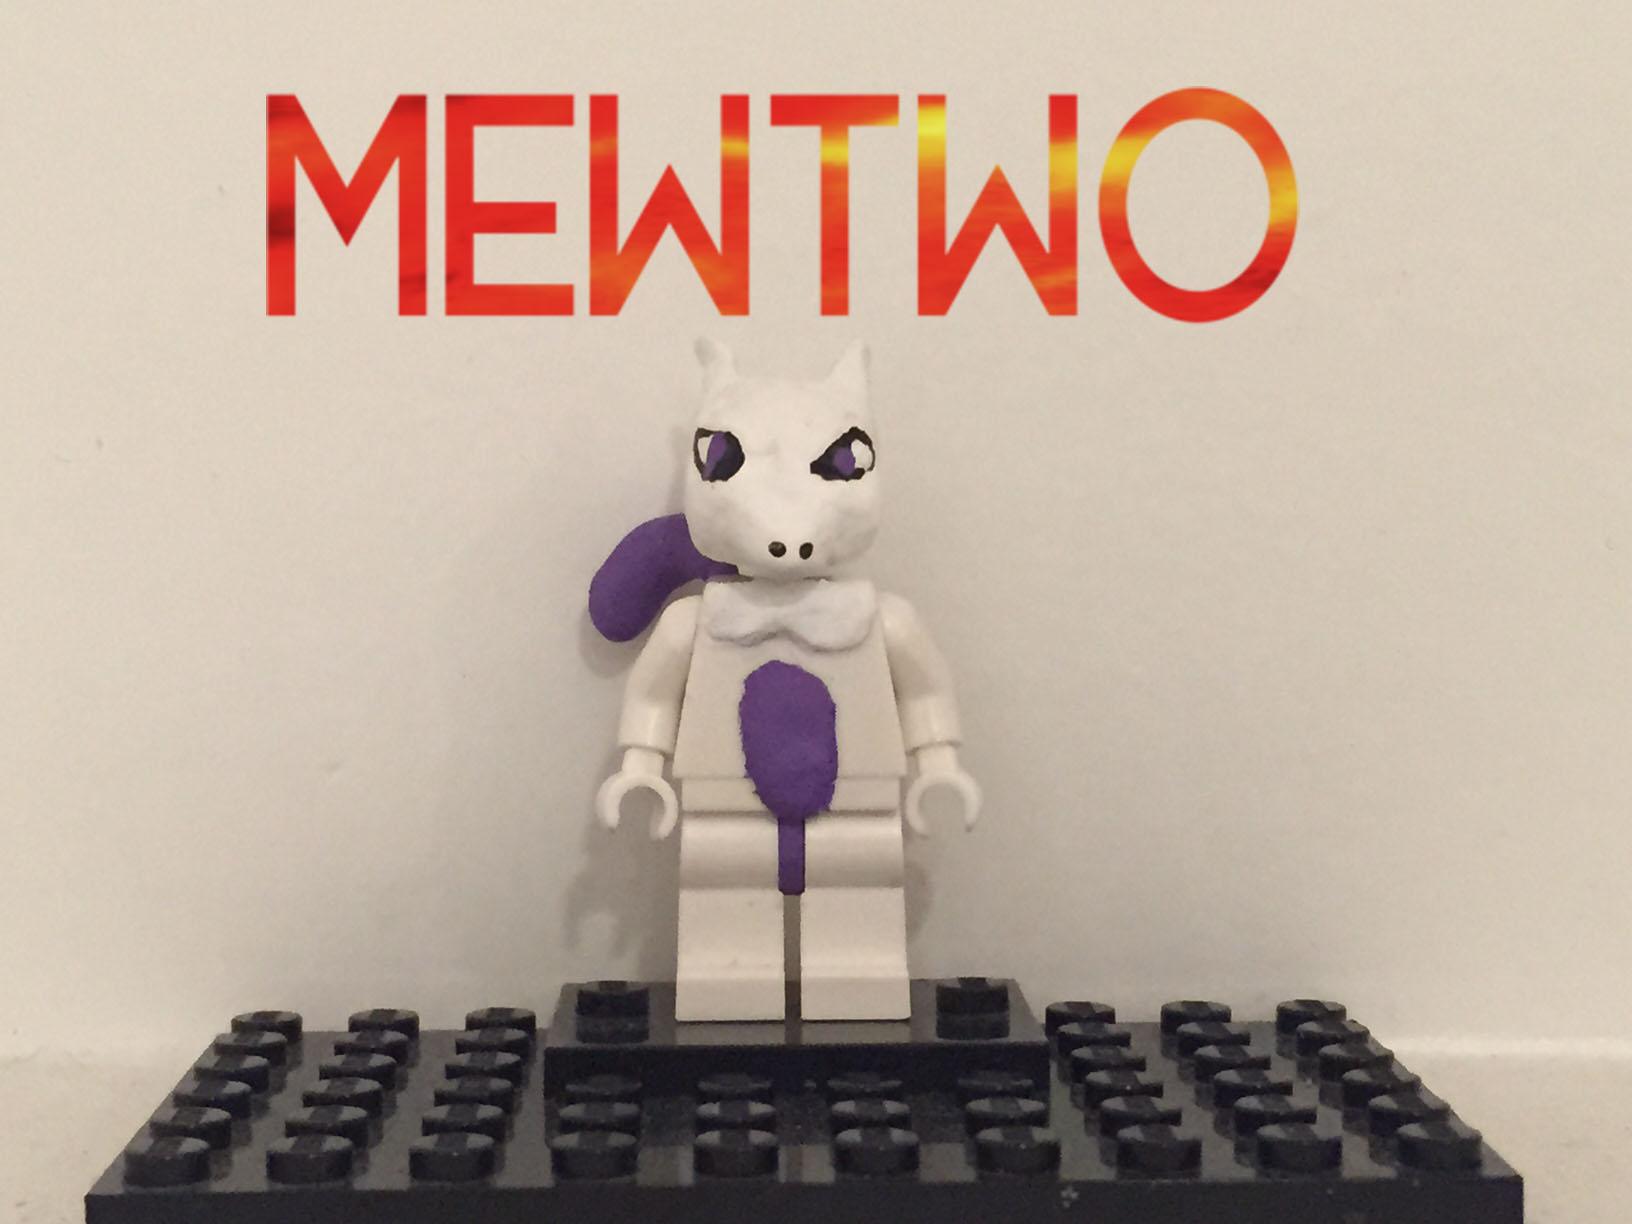 Wallpaper Lego Nintendo Pokemon Custom Minifigure Mewtwo